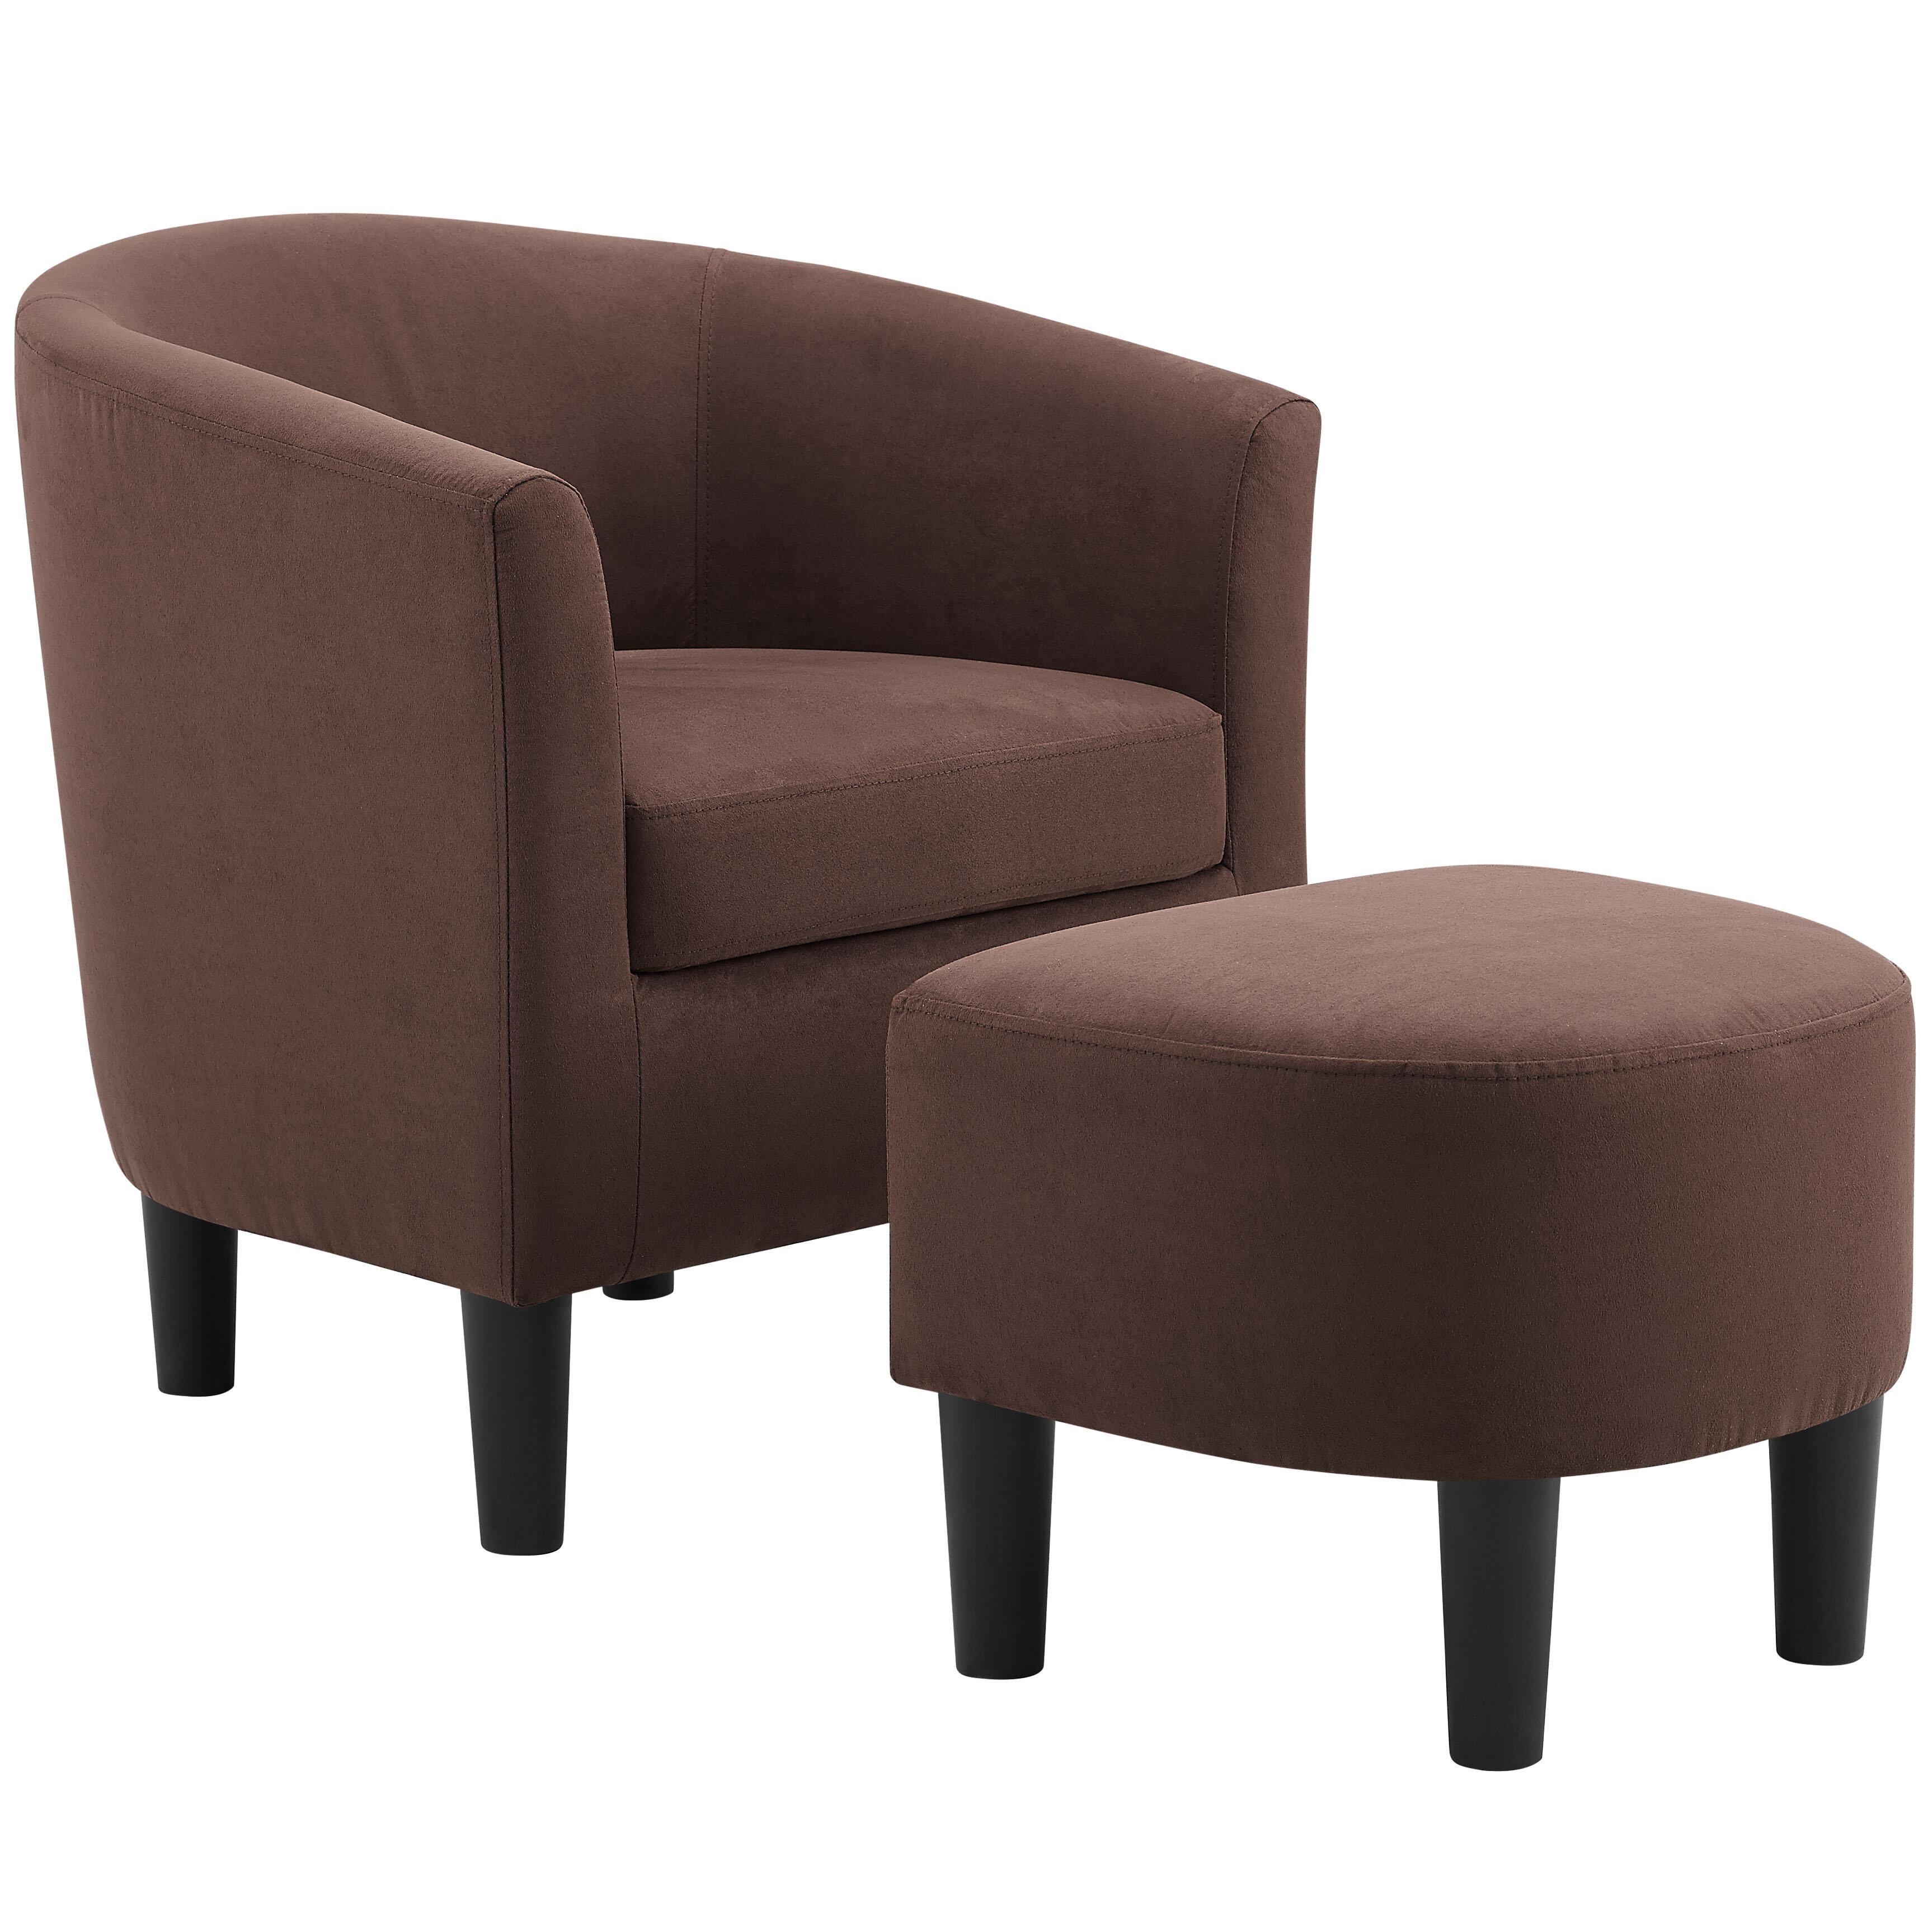 Superb Jazouli Linen Barrel Chair And Ottoman Cjindustries Chair Design For Home Cjindustriesco